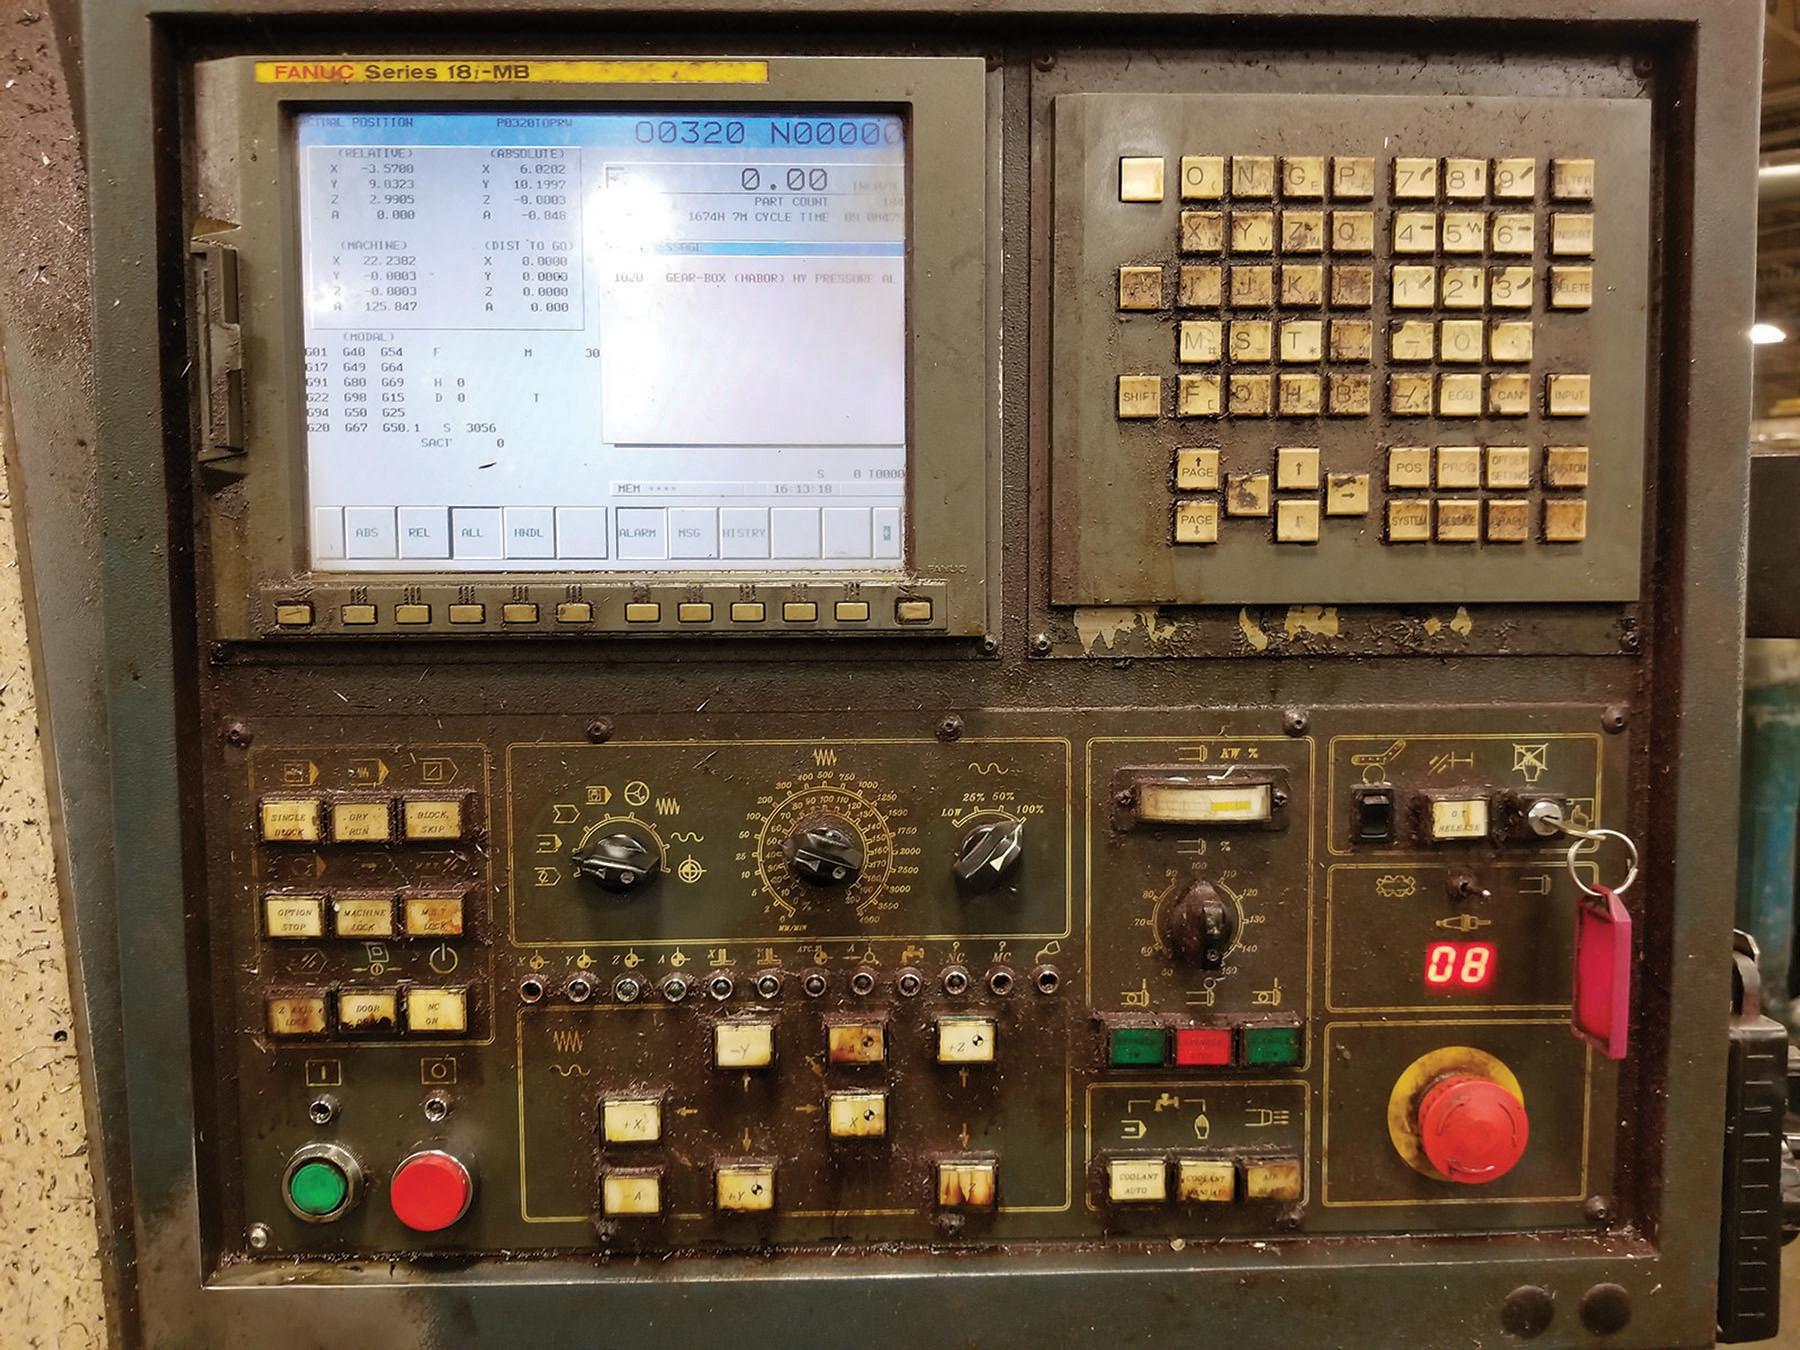 Lot 35 - 2003 JOHNFORD SUPER VERTICAL SV-32 VERTICAL MACHINING CENTER, 4-AXIS, S/N MB2302, 17.5'' X 39.25''